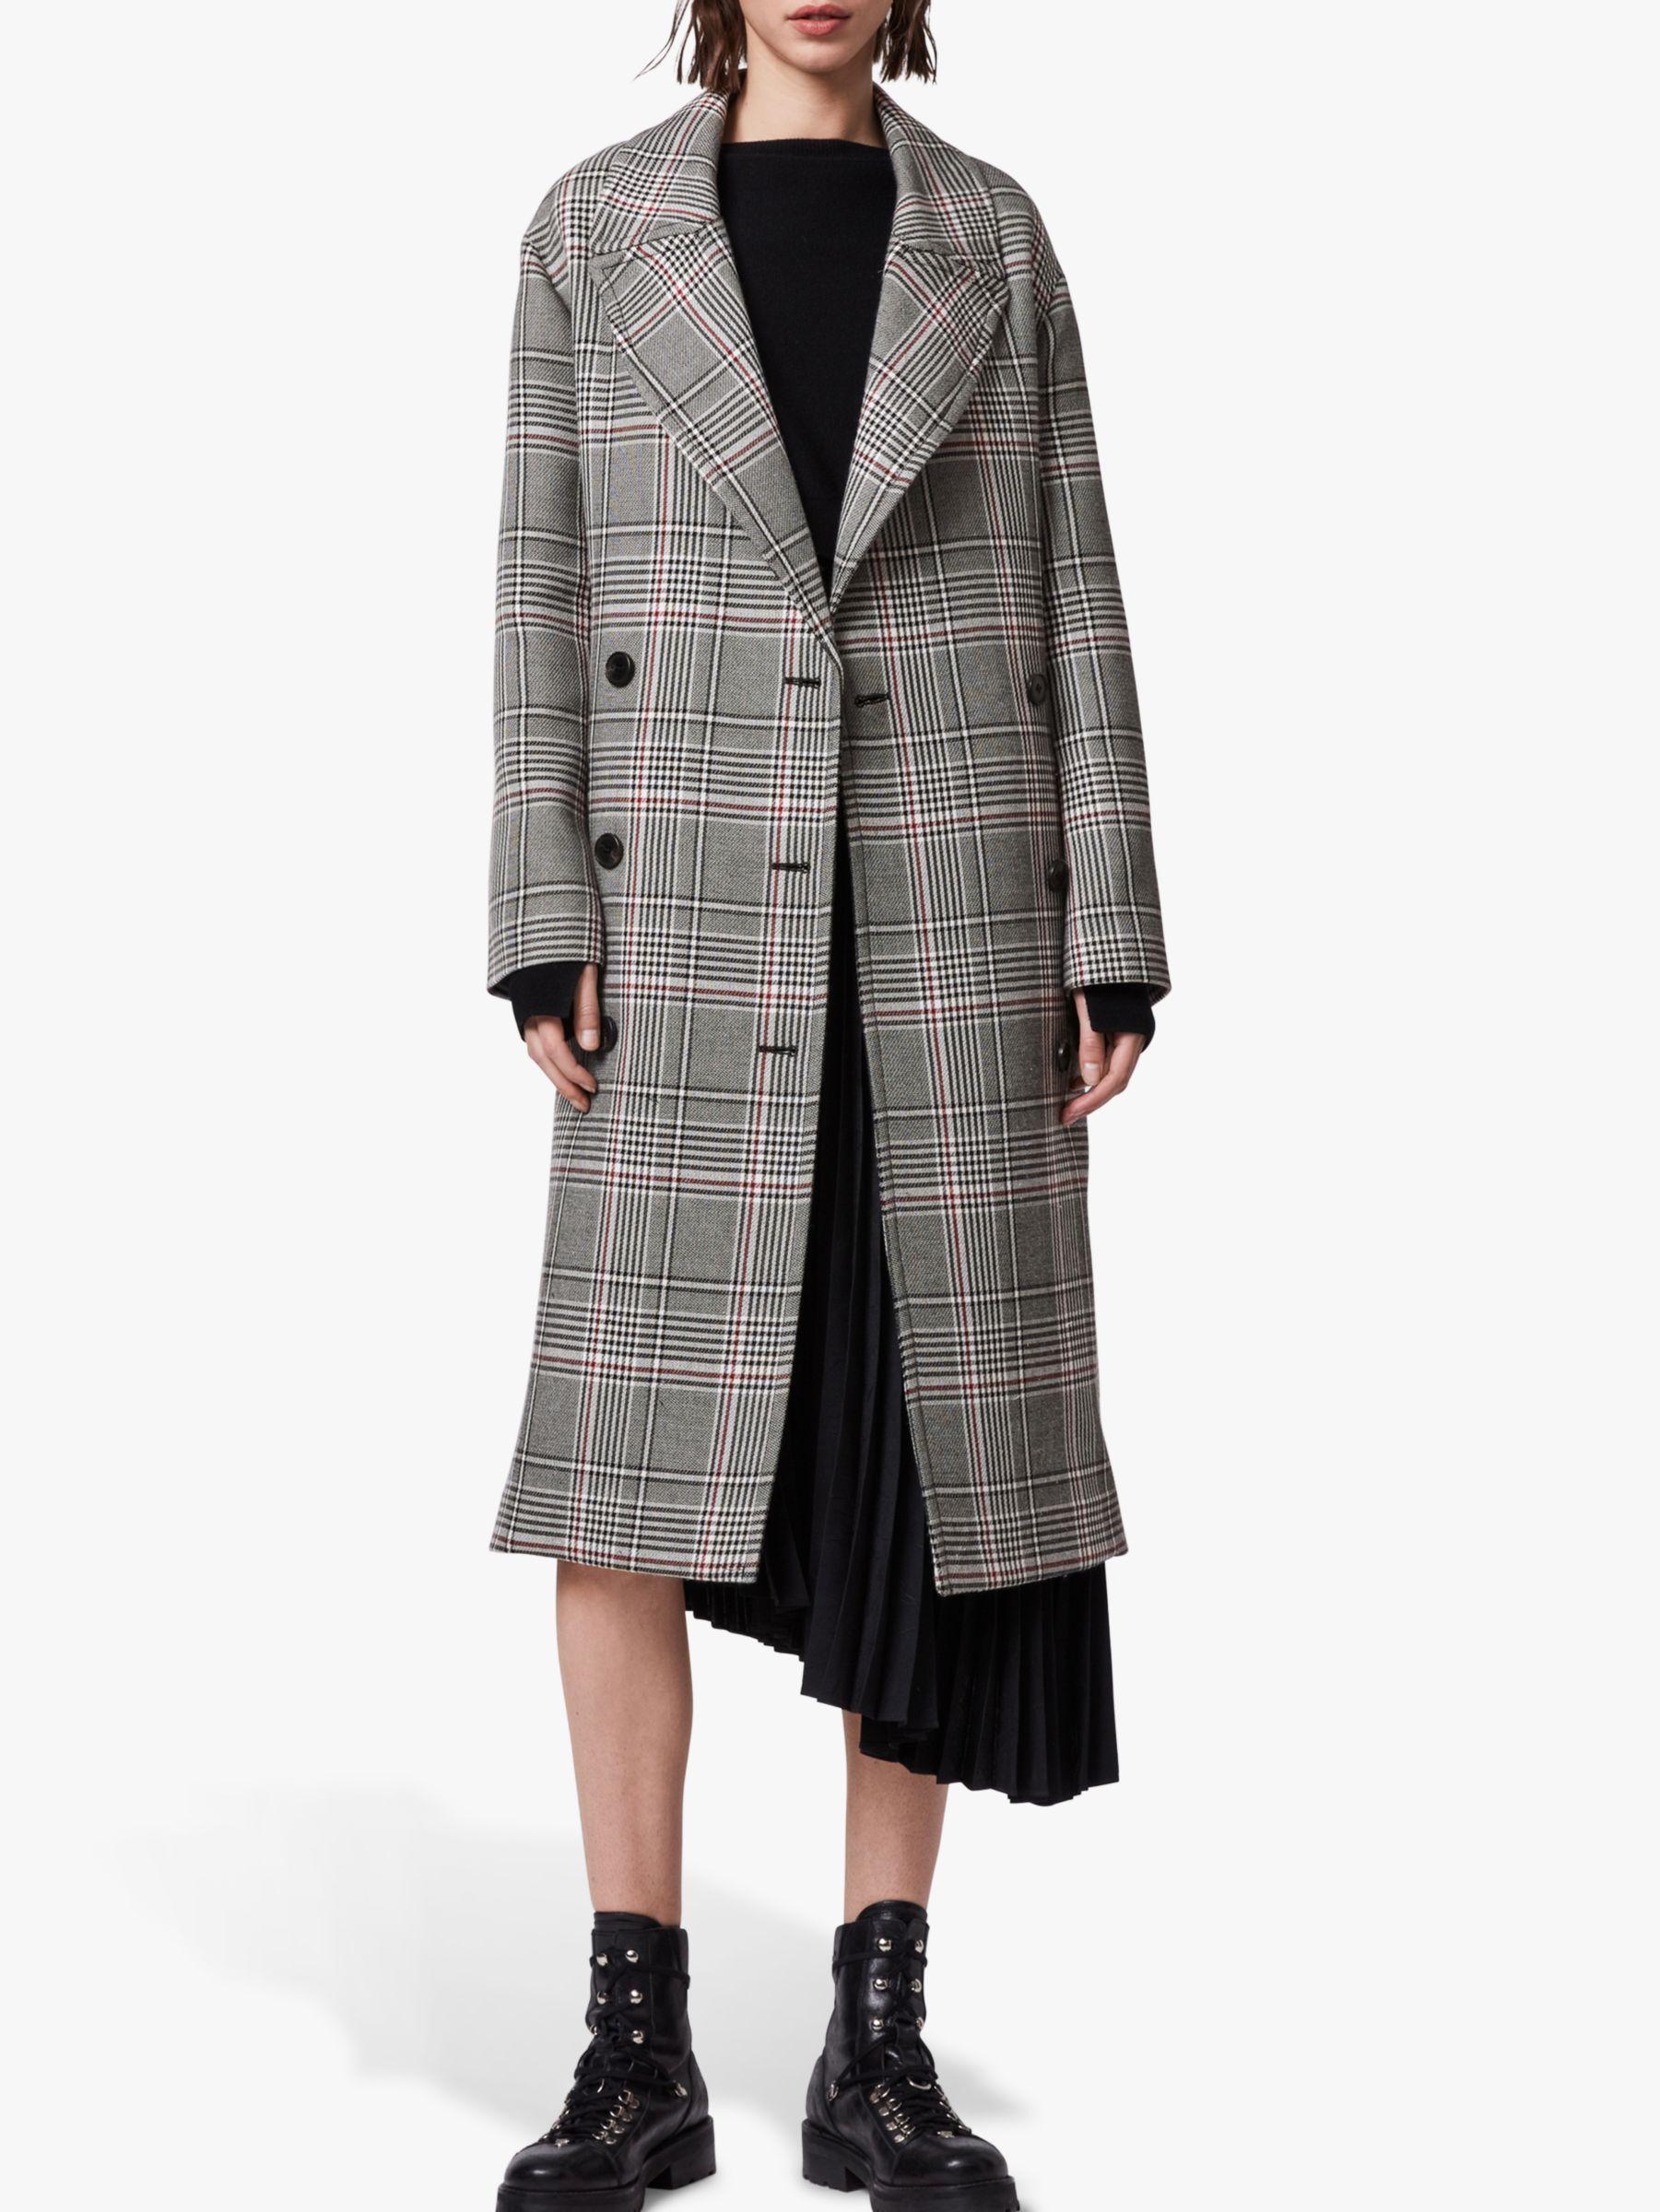 AllSaints AllSaints Tyla Check Trench Coat, Black/White